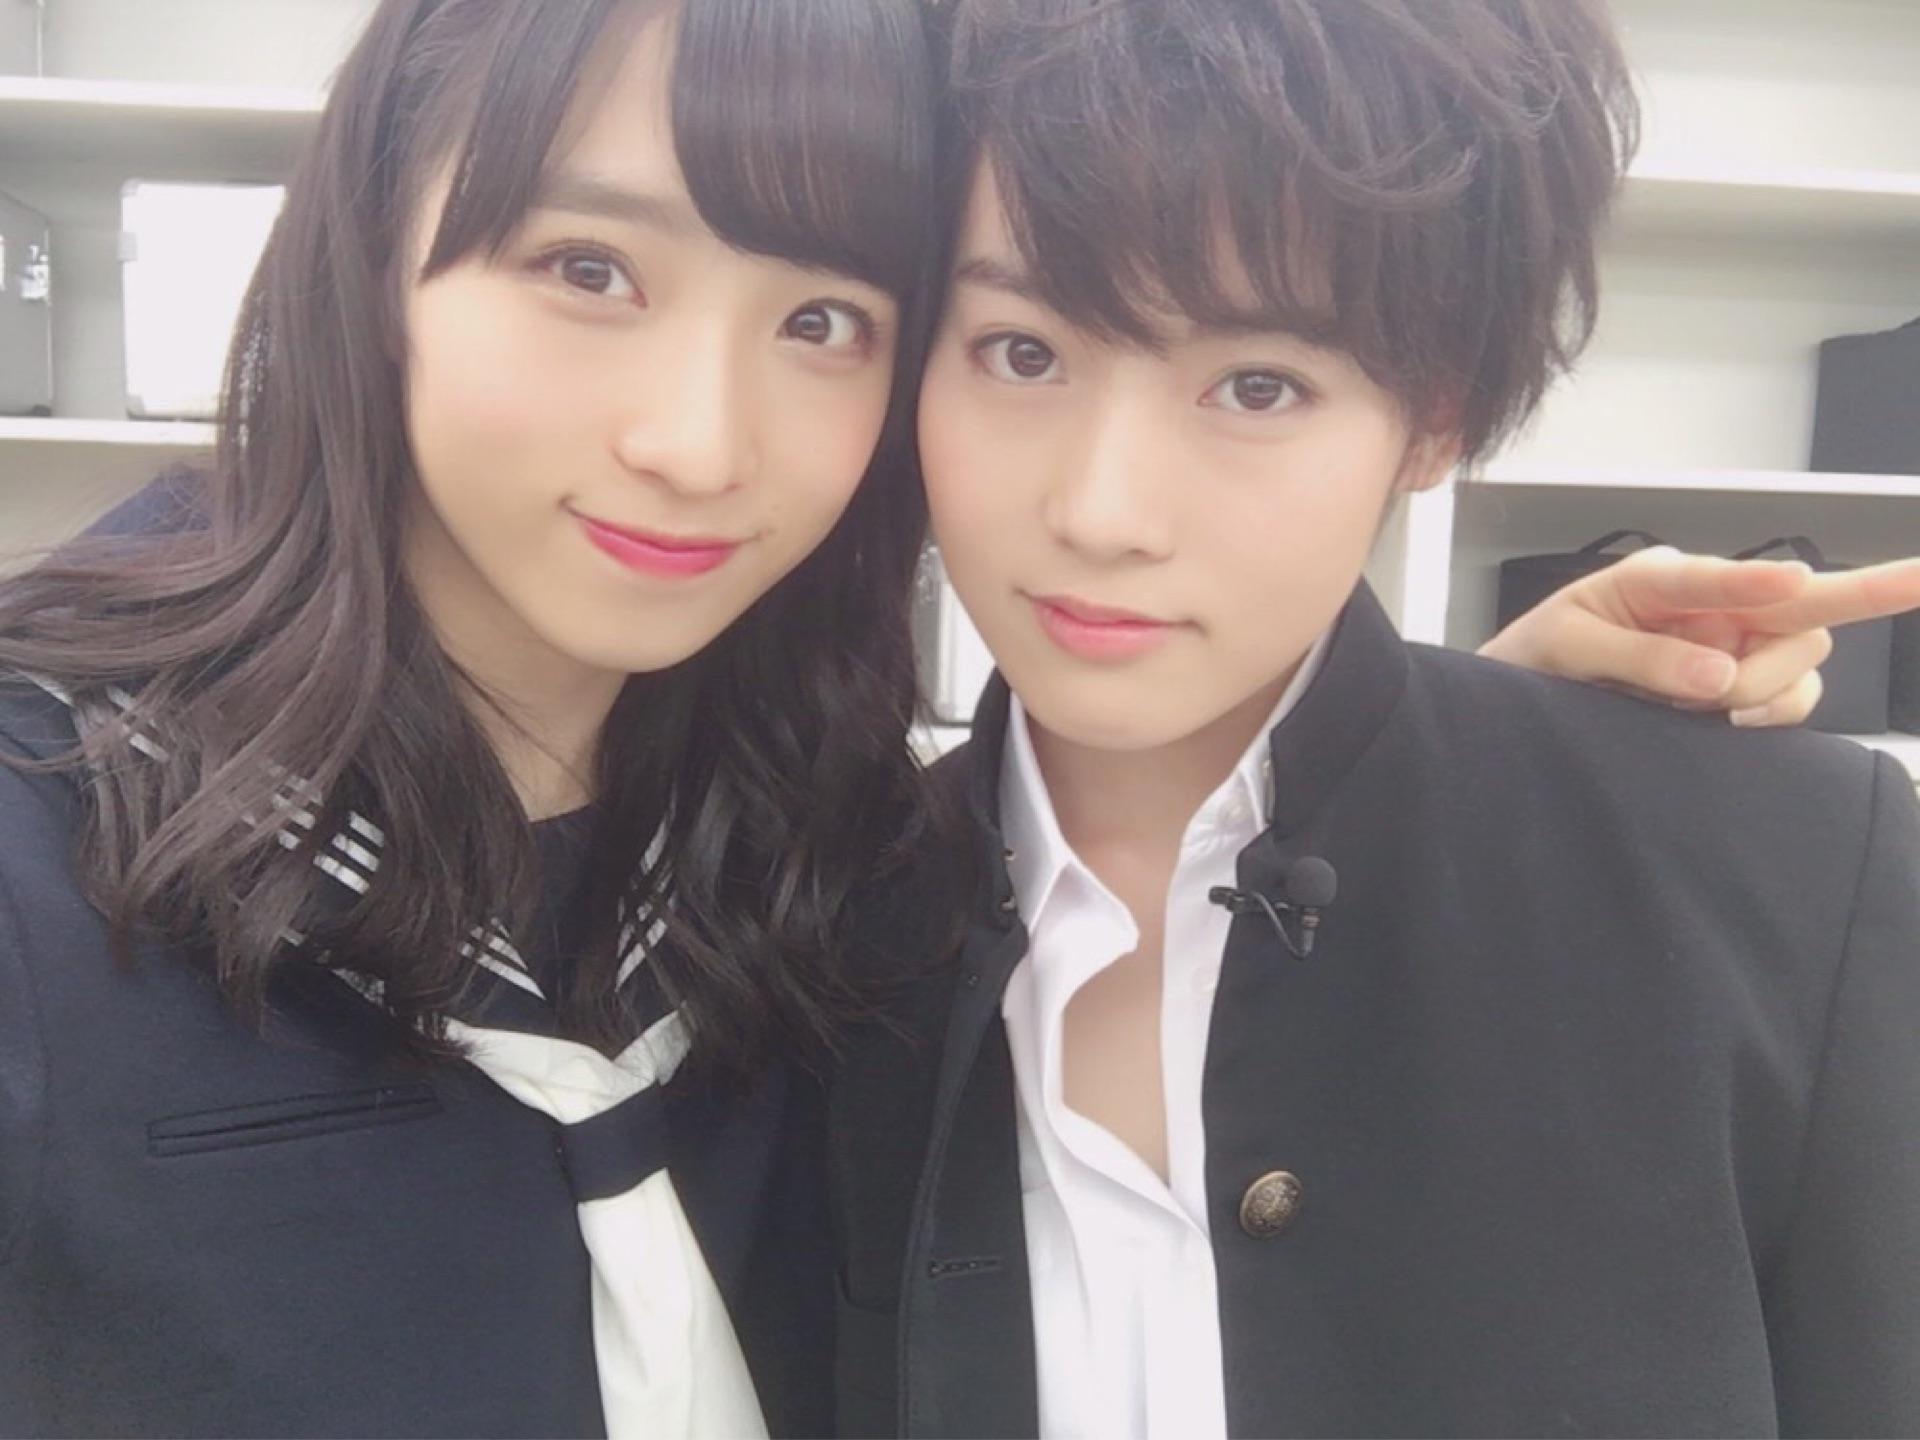 【AKB48】チーム8応援スレ ☆280【47の素敵な街へ】YouTube動画>8本 ->画像>213枚